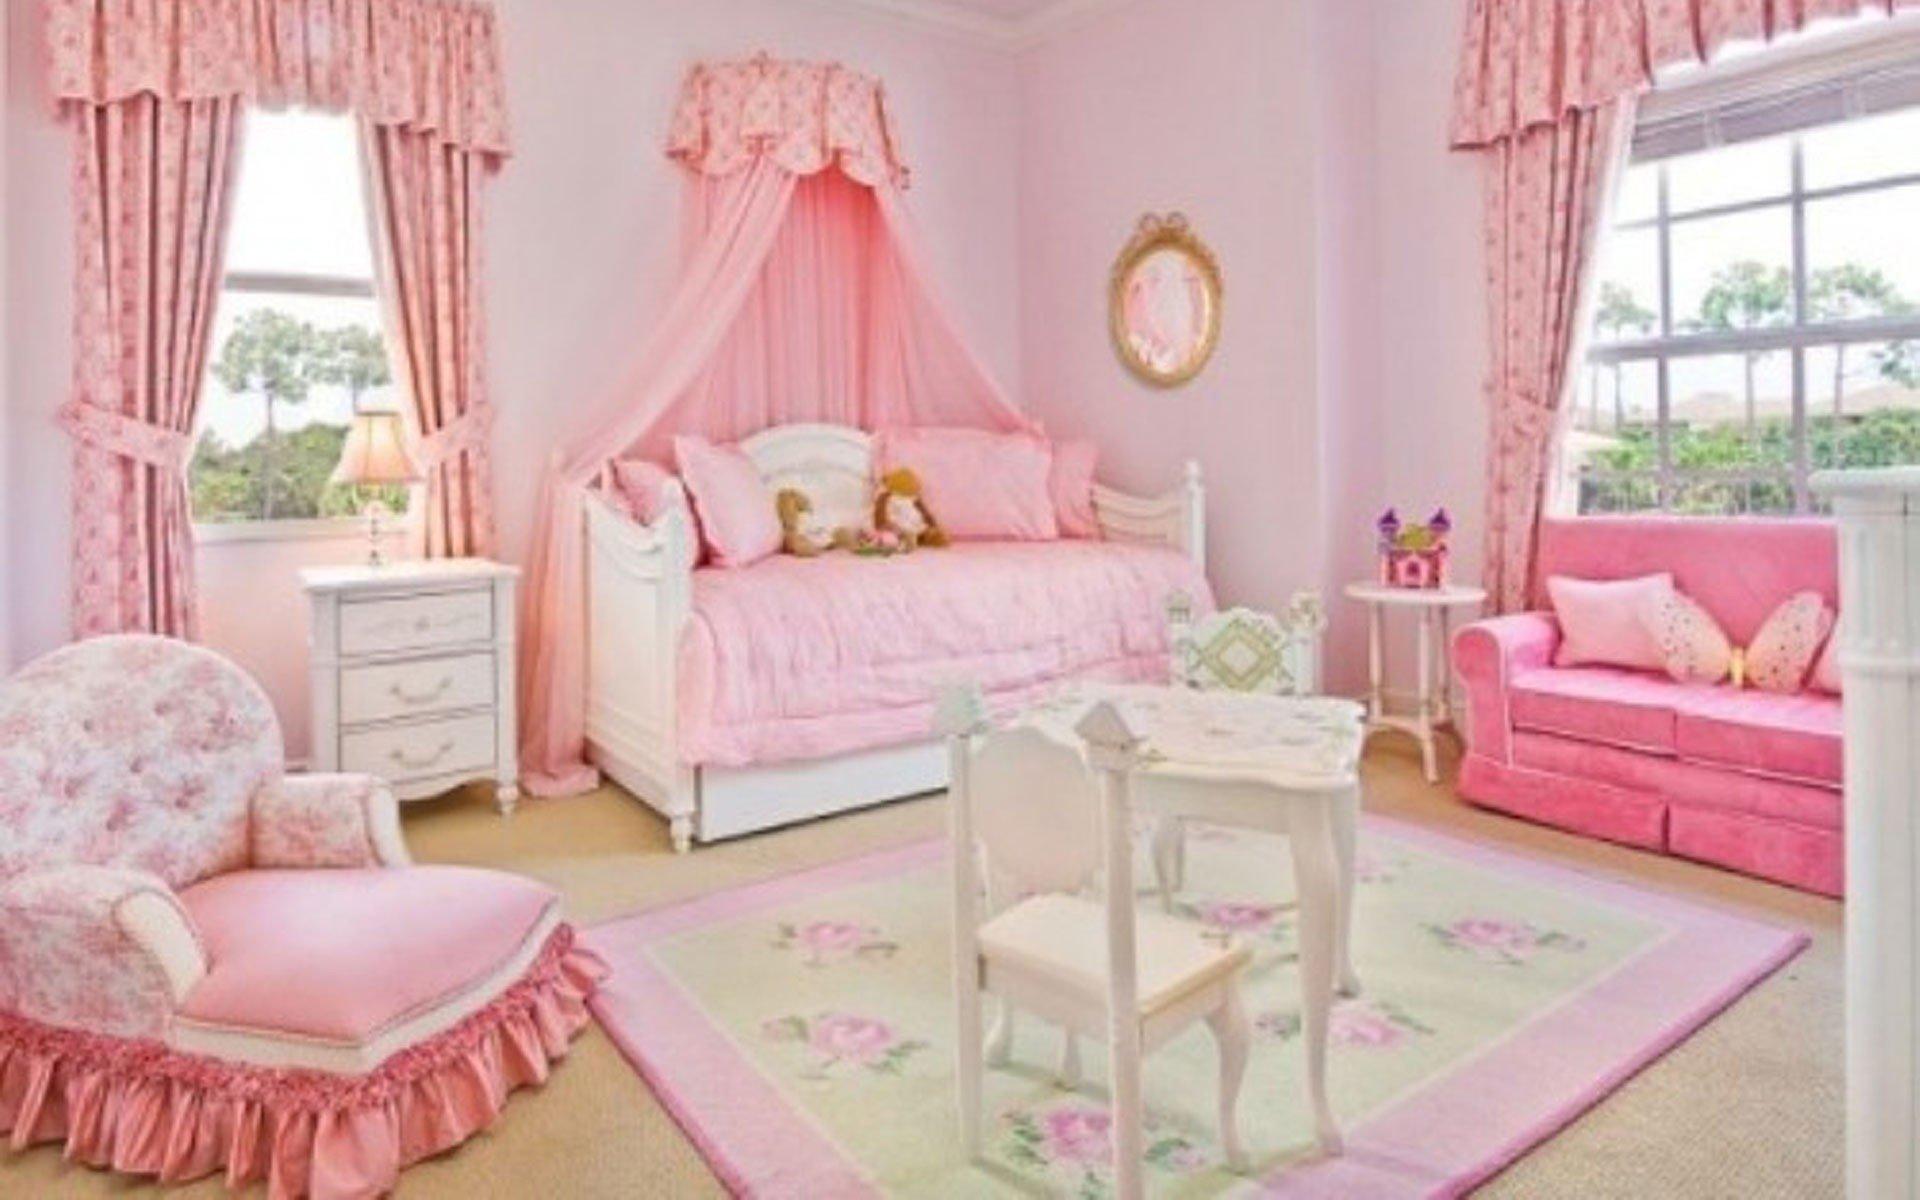 10 Nice Cute Little Girl Room Ideas interior adorable ideas of little girls room decorations teen 2020